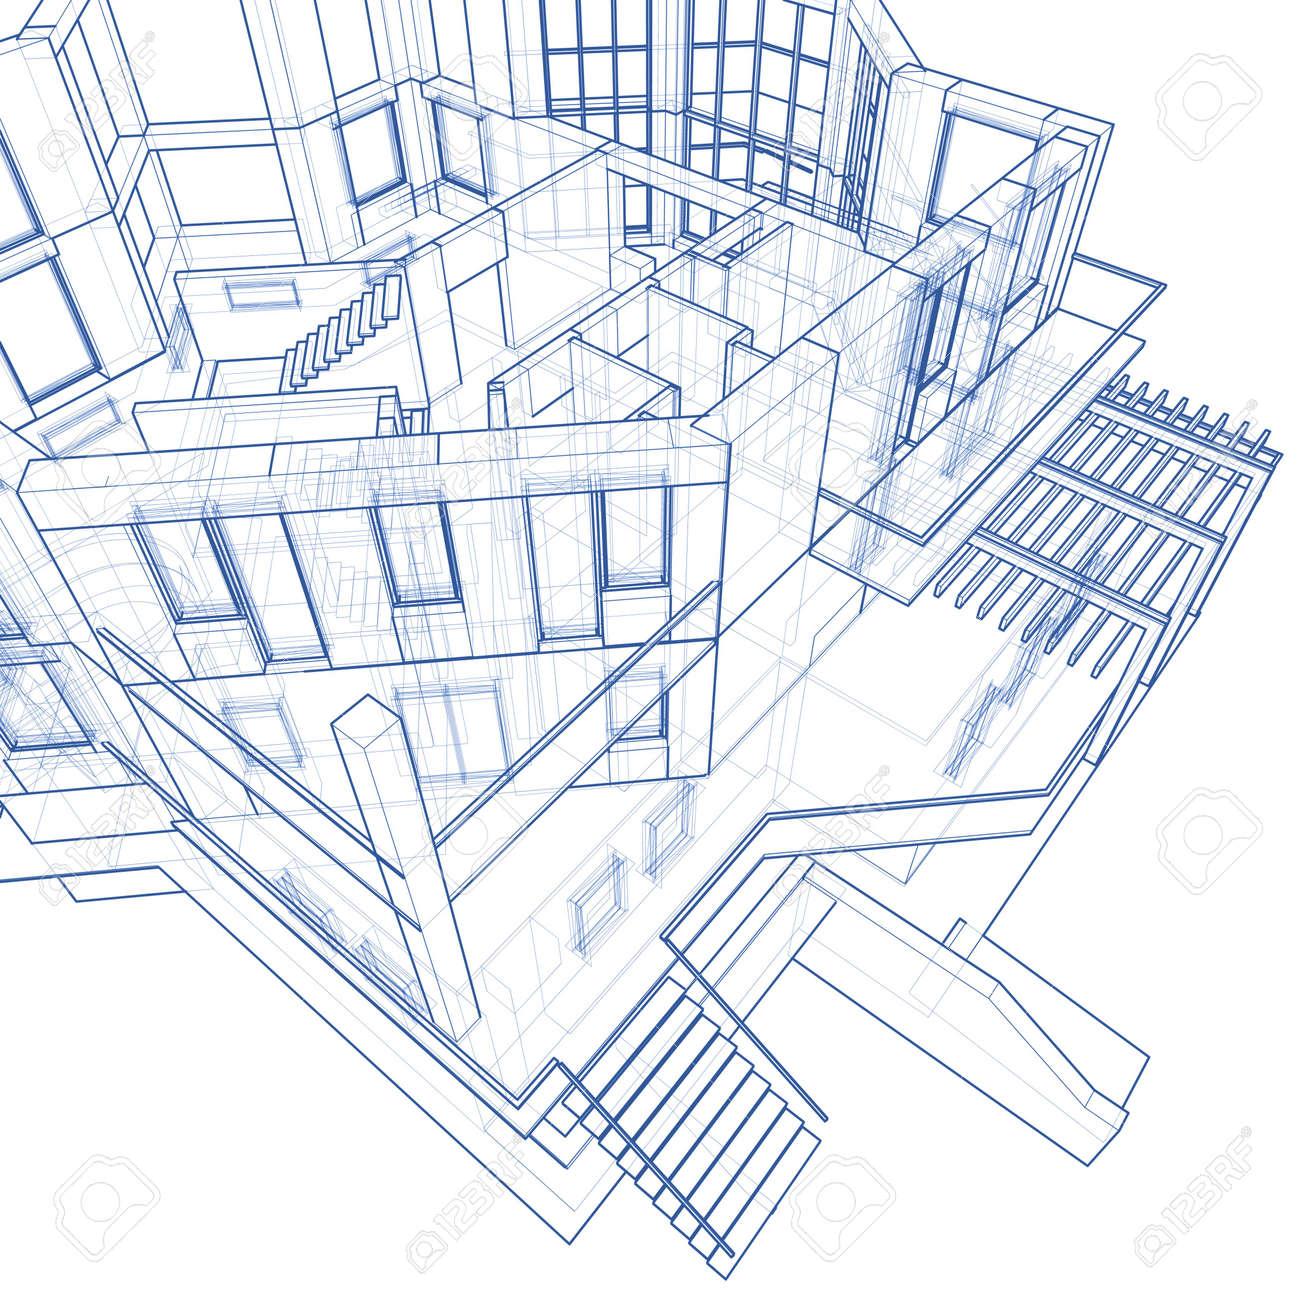 3d blueprint house vector technical draw stock photo picture and 3d blueprint house vector technical draw stock photo 3750089 malvernweather Choice Image